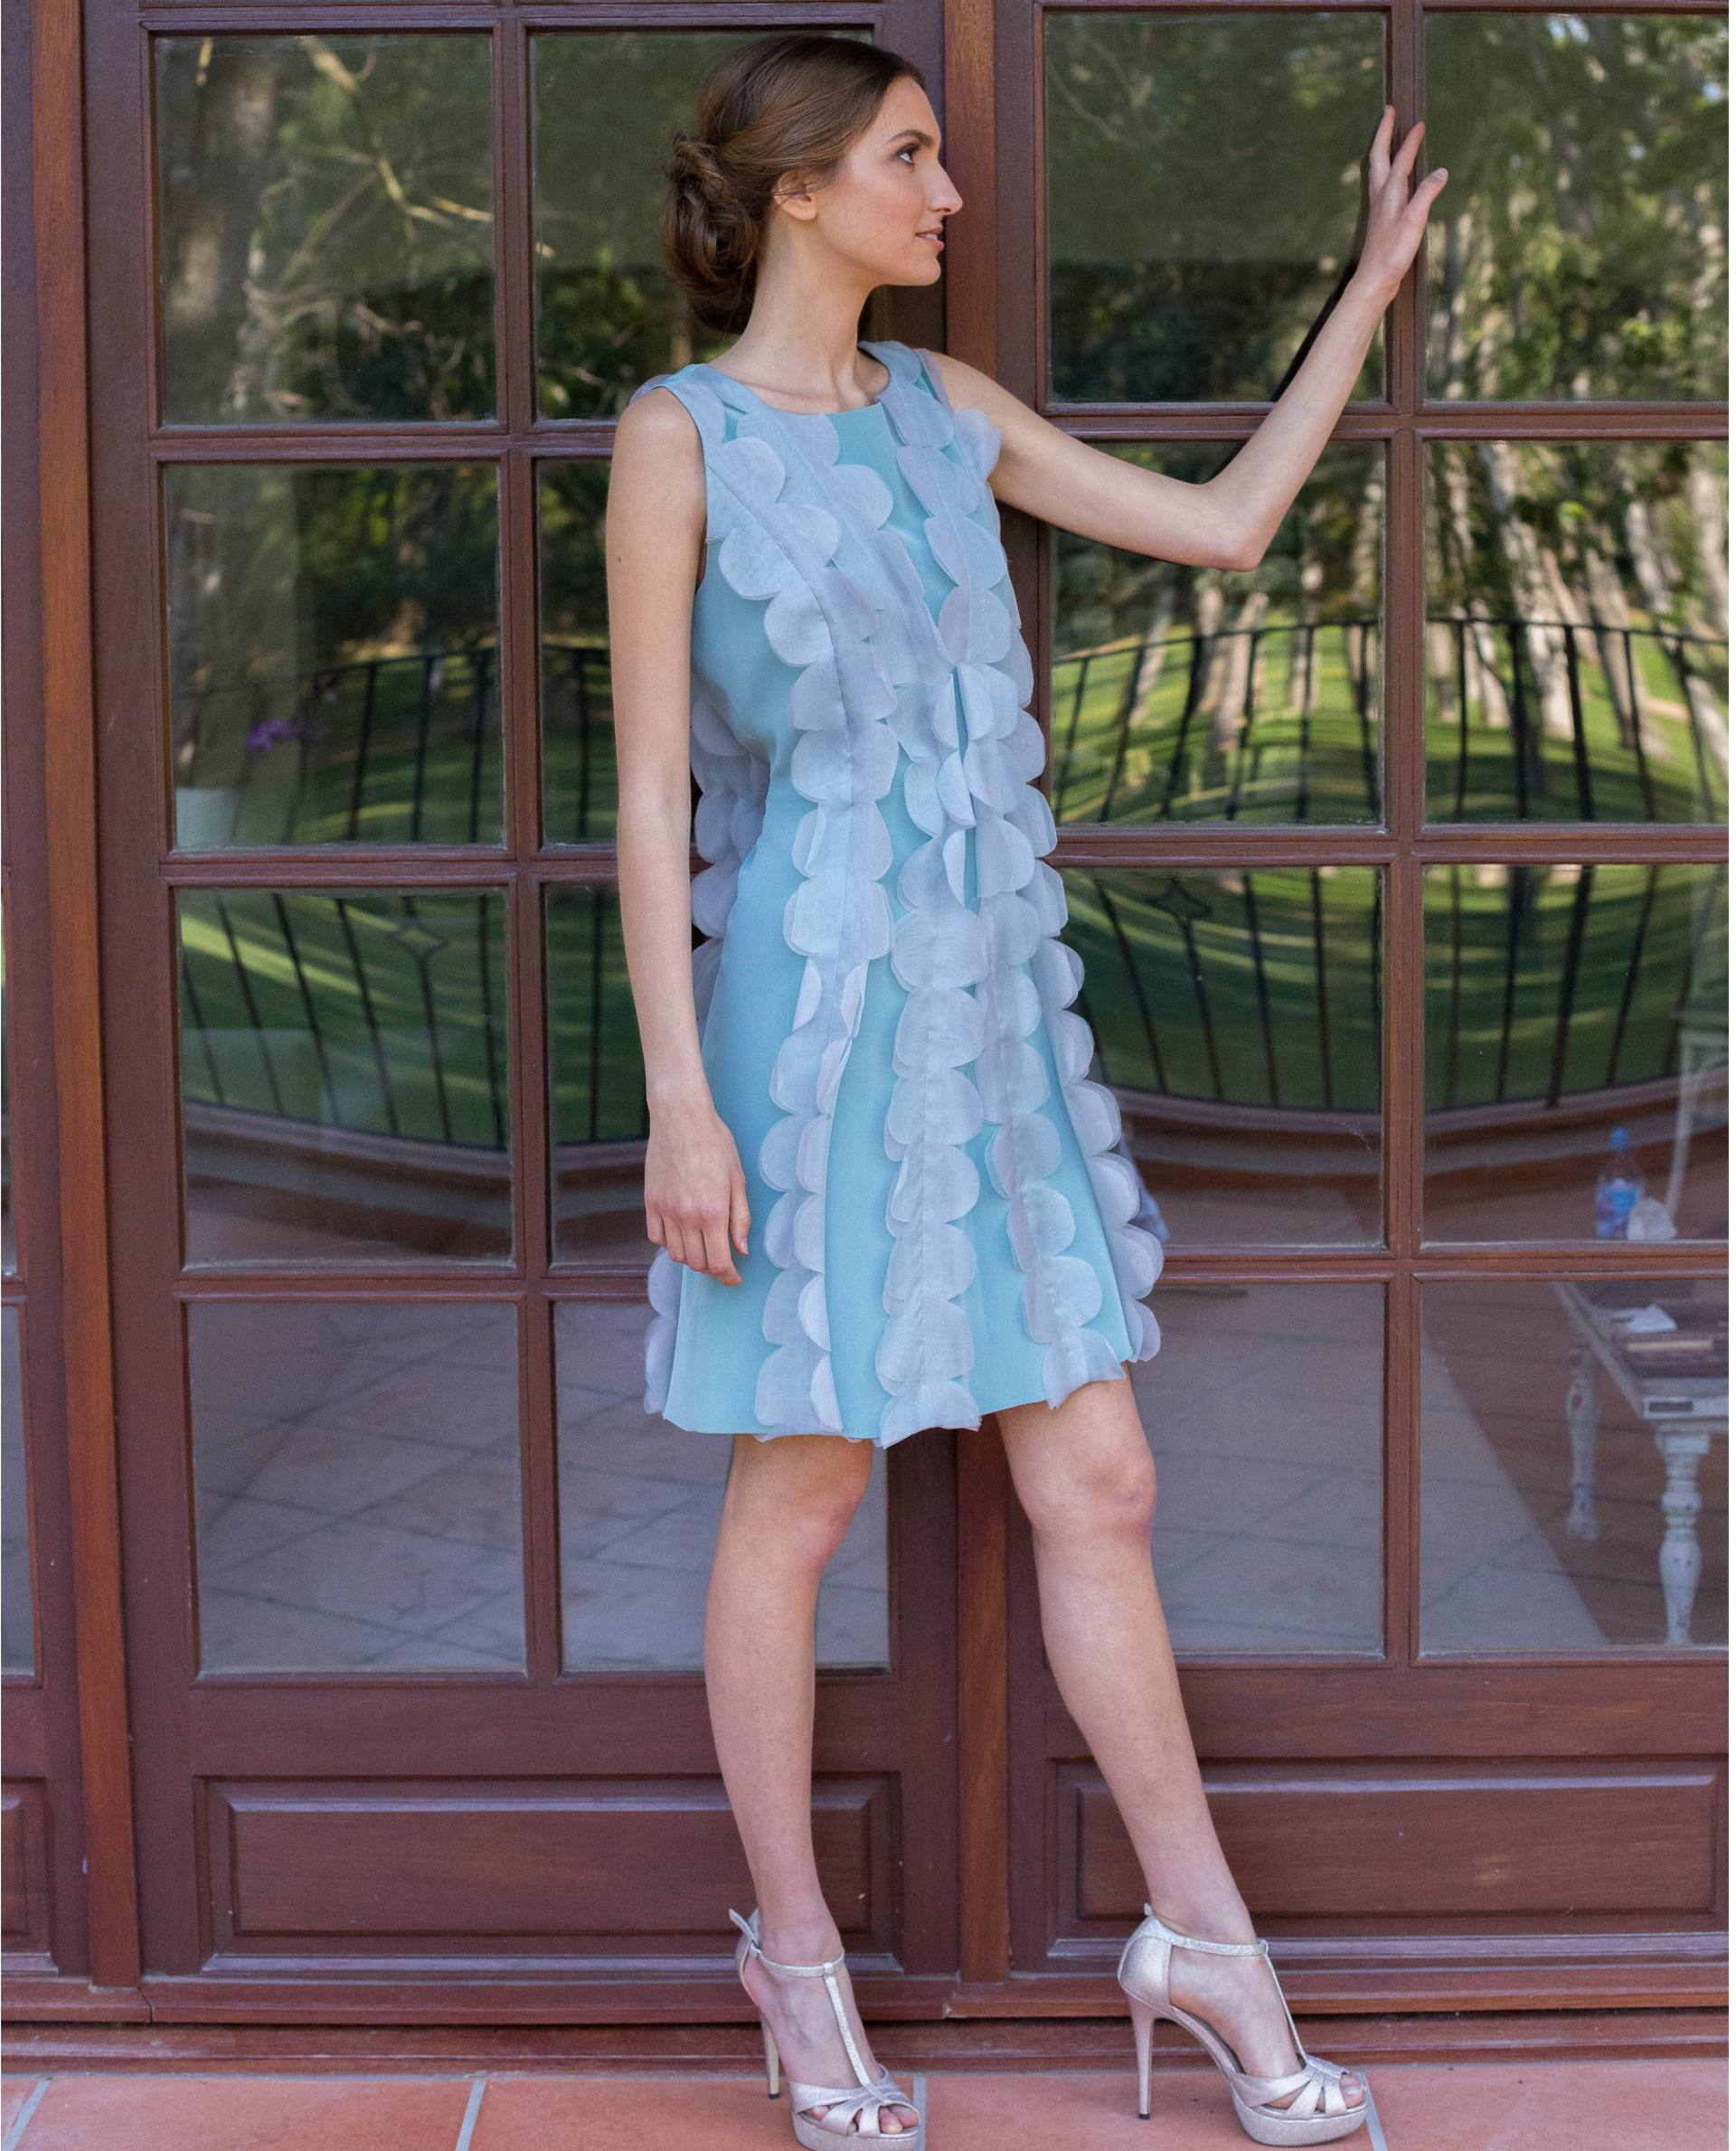 ATELIER-NATURE 2017/18 - VESTIDOS - vestido fiesta VALERIA azul